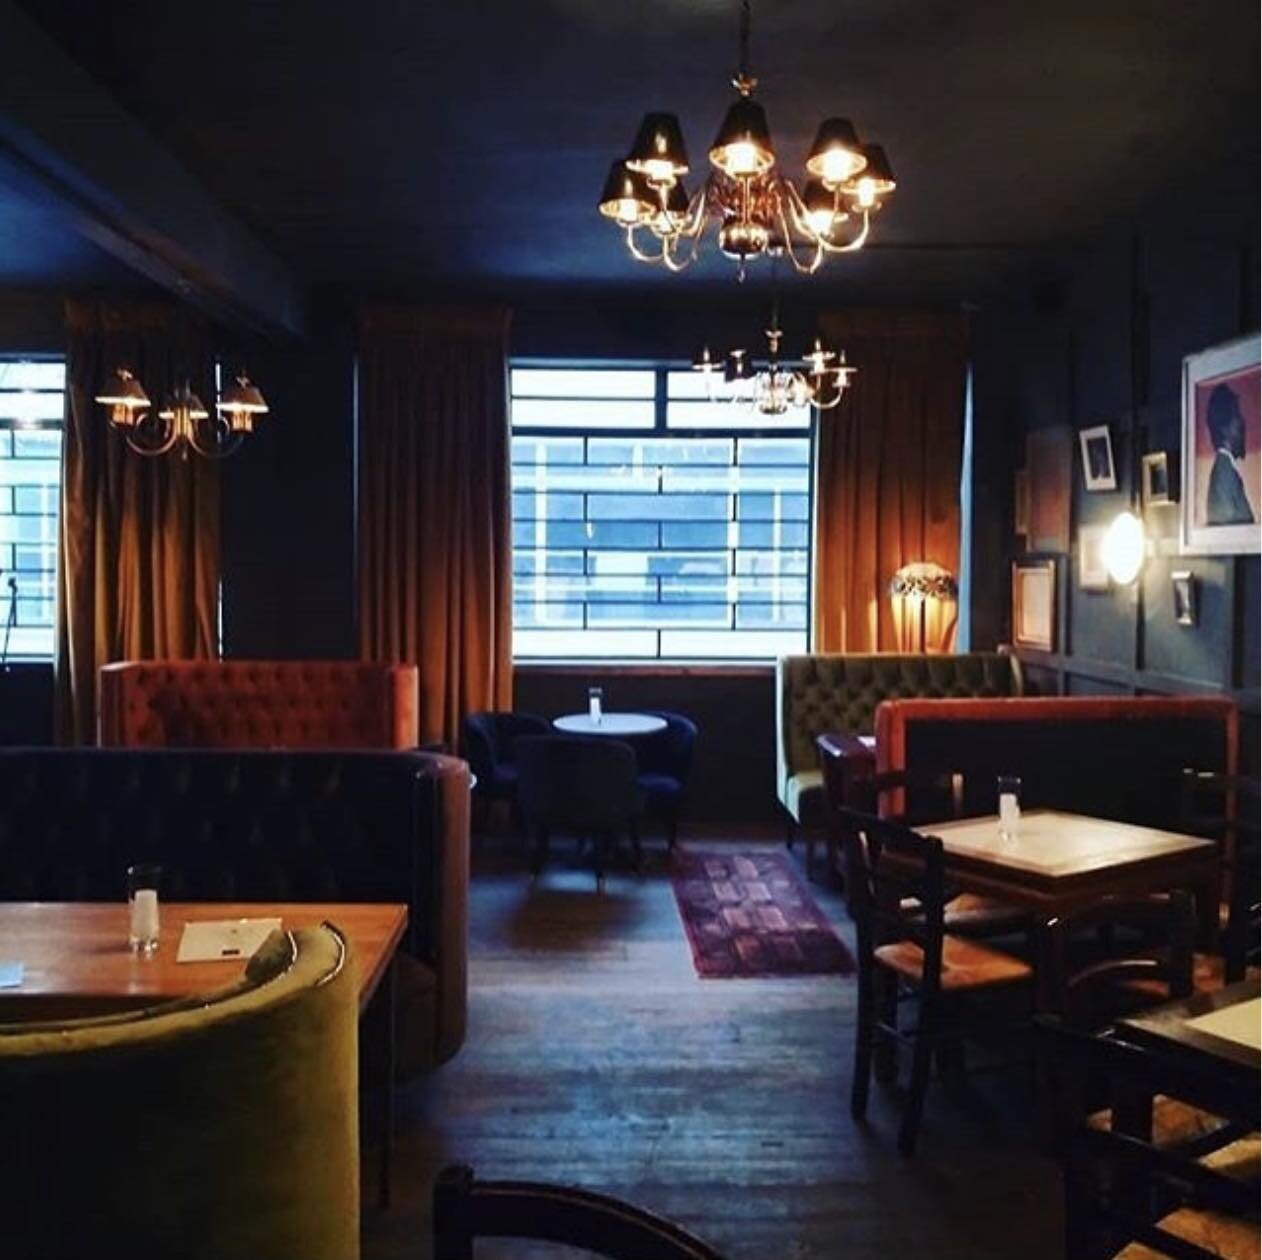 CLF Art Lounge Peckham. Image:  @vmt_b